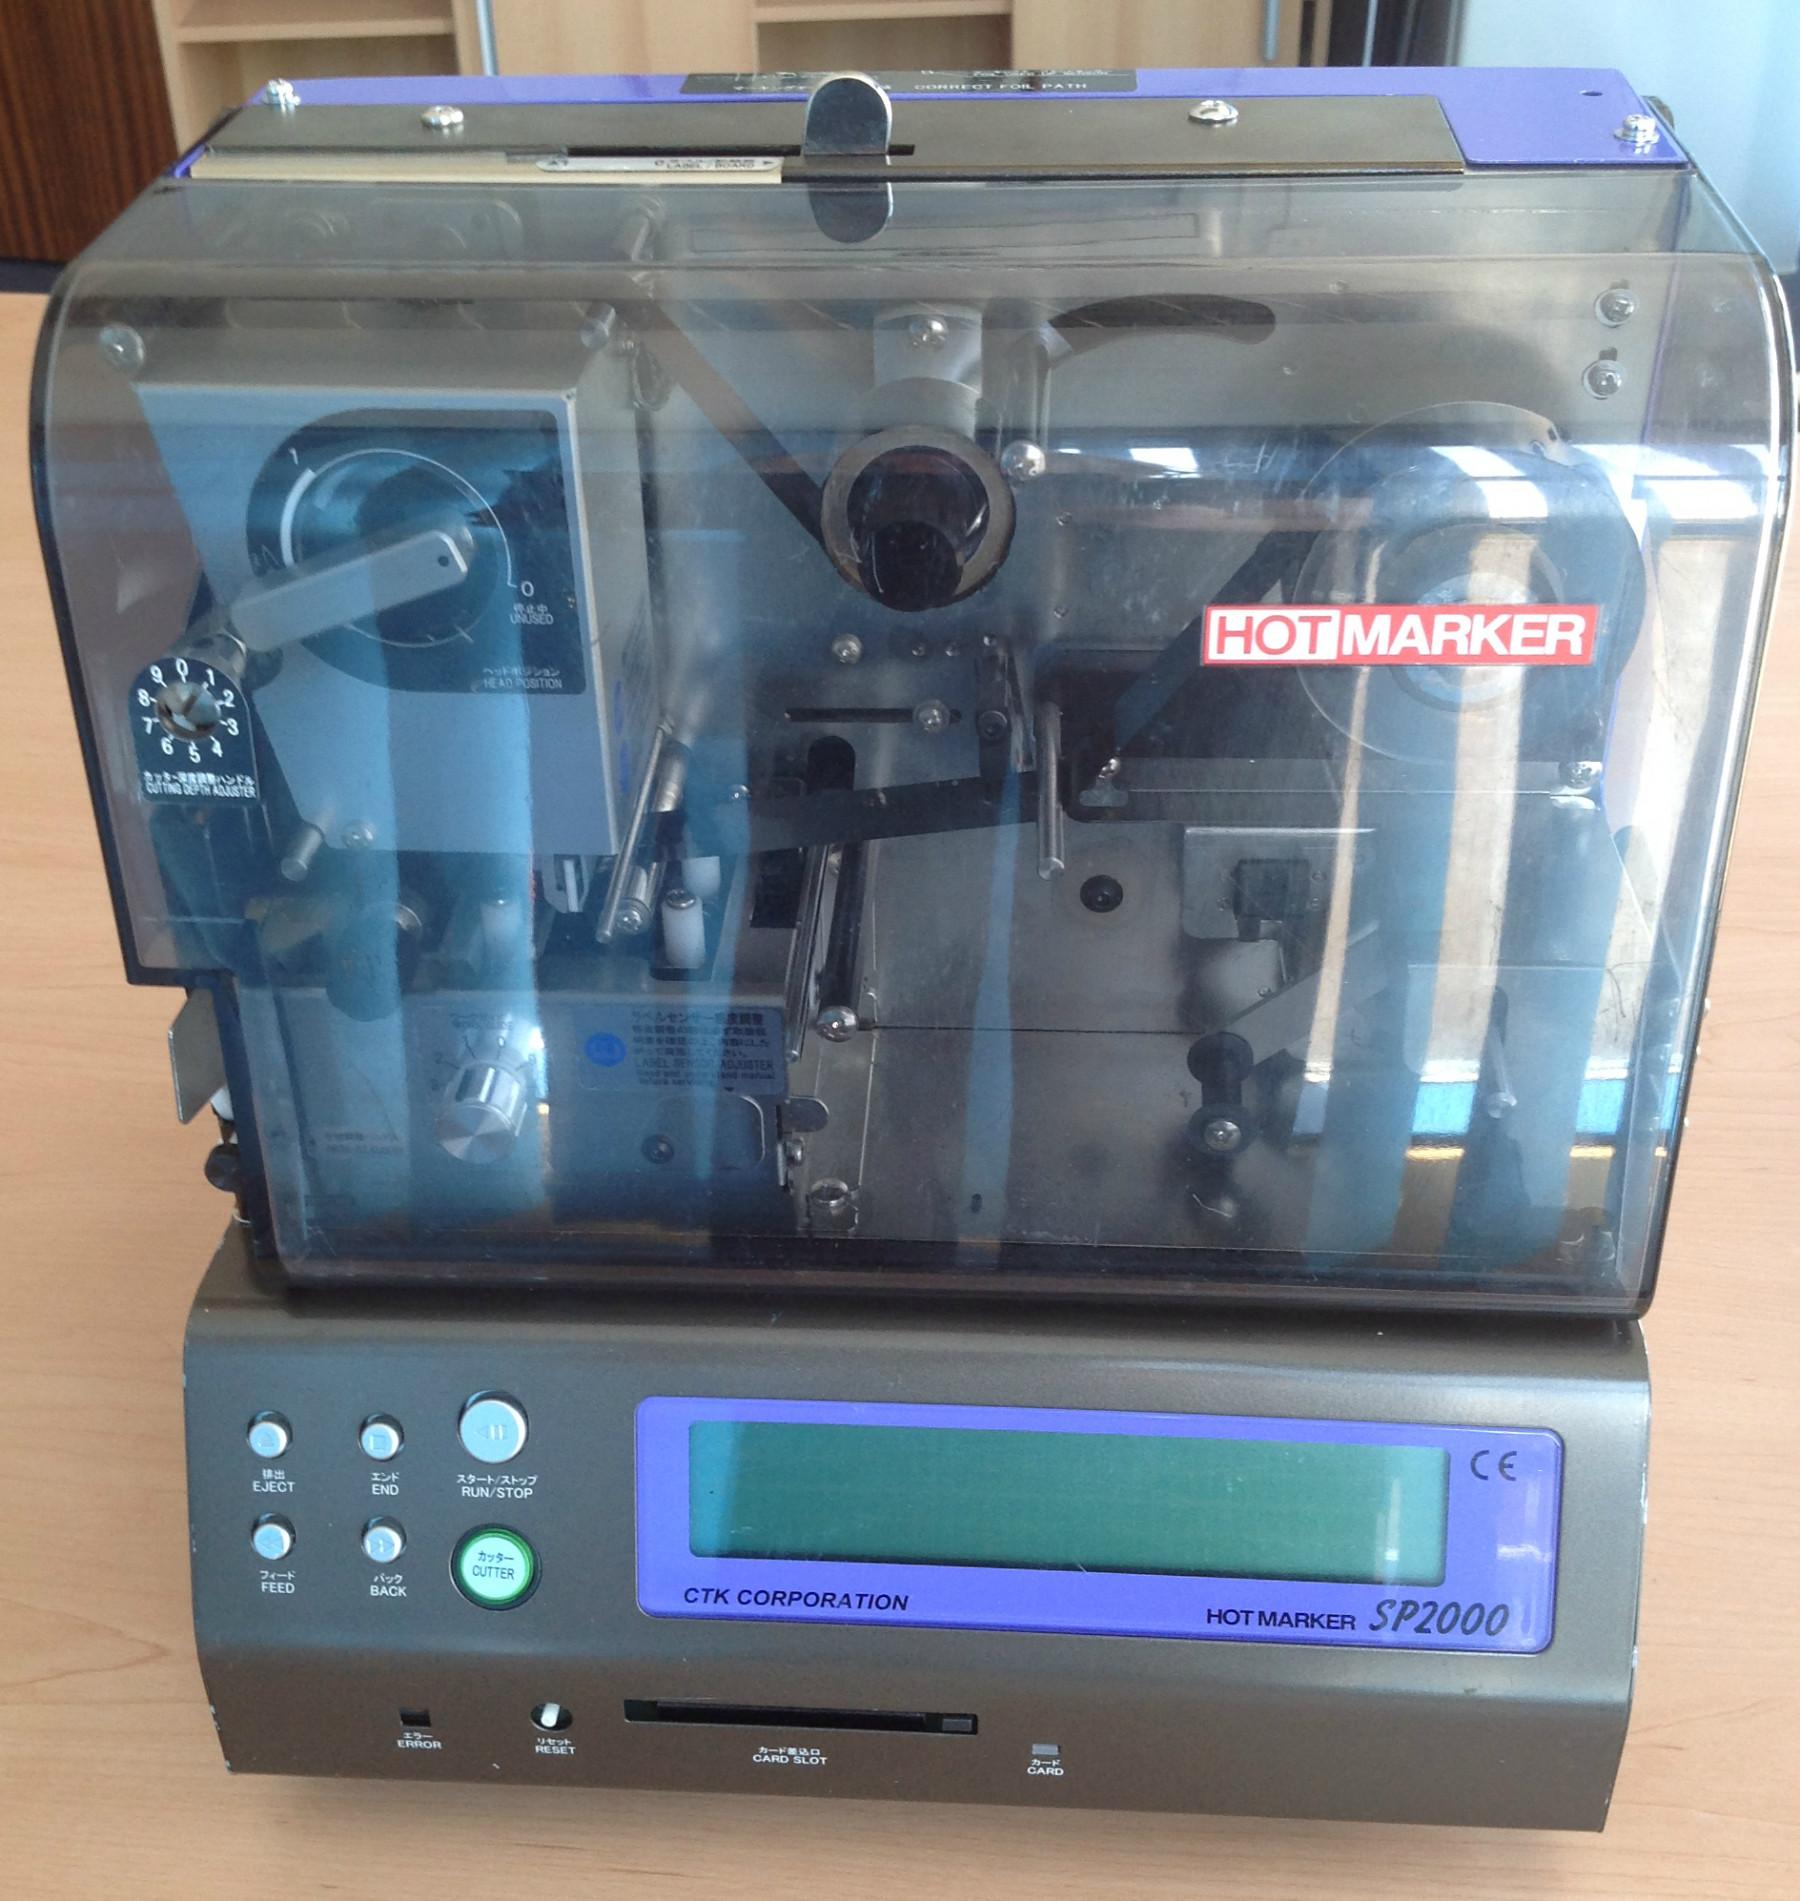 SP2000 Thermal Transfer Label Printer